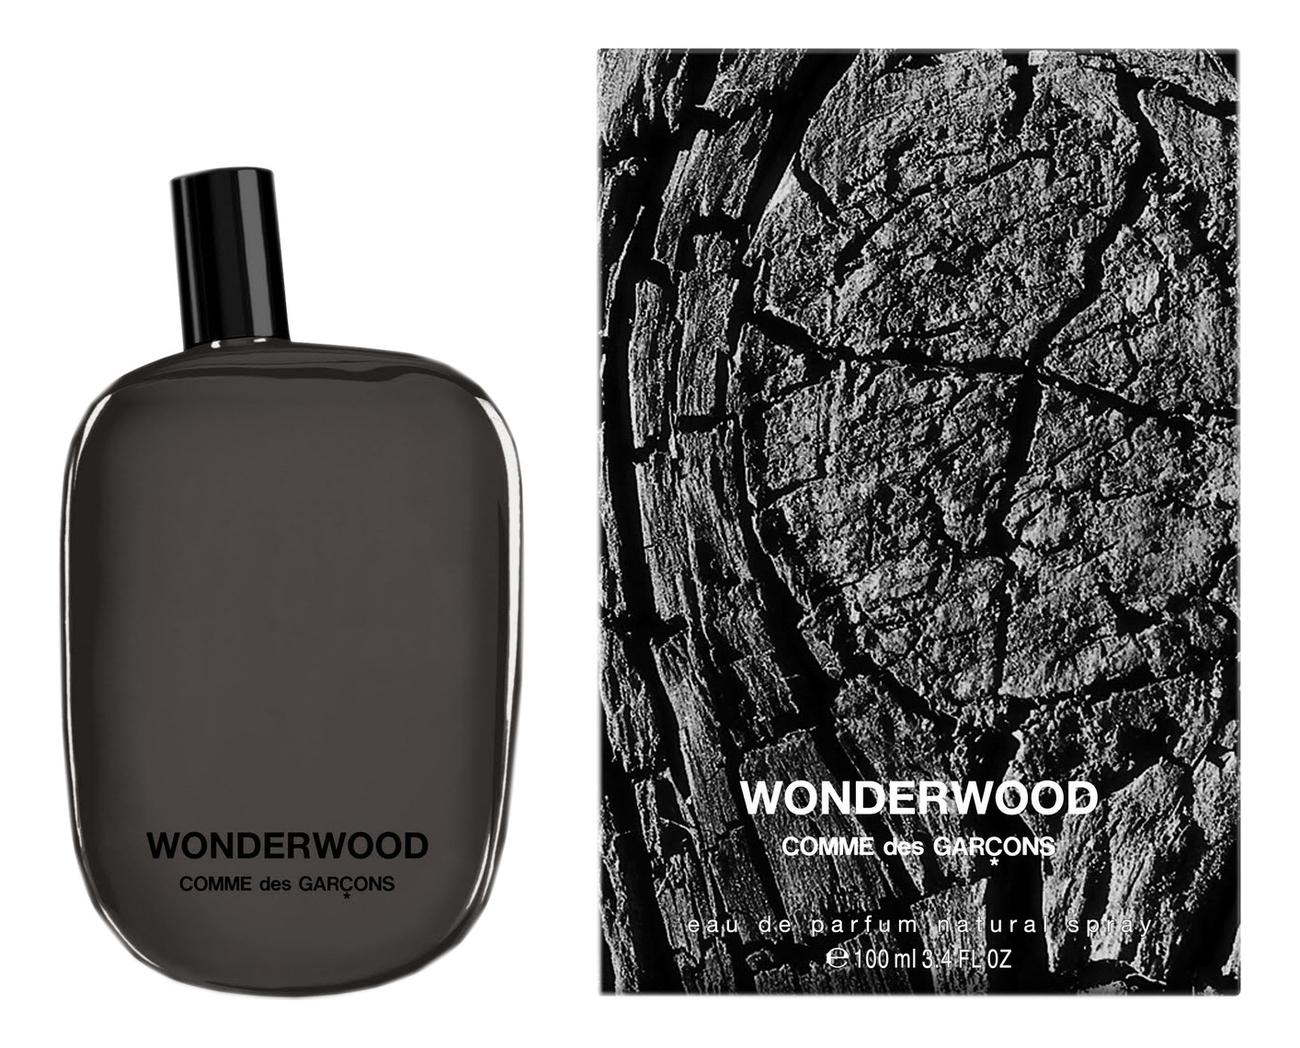 цена Comme des Garcons Wonderwood: парфюмерная вода 100мл онлайн в 2017 году